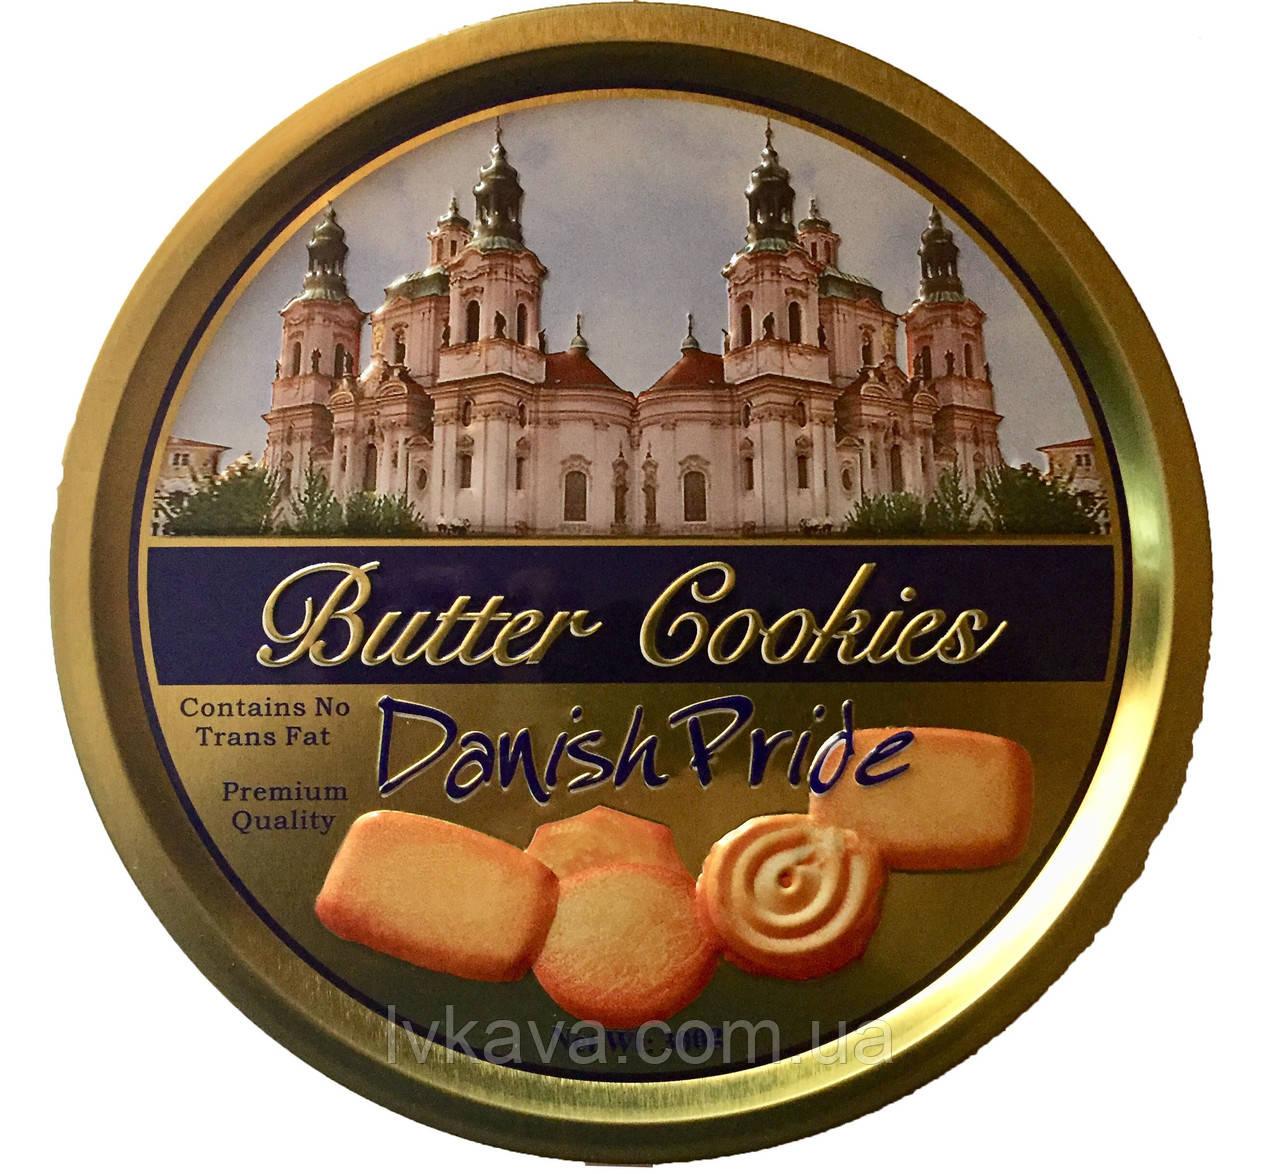 Печенье ассорти Butter cookies Danish Pride, 300 гр, ж\б